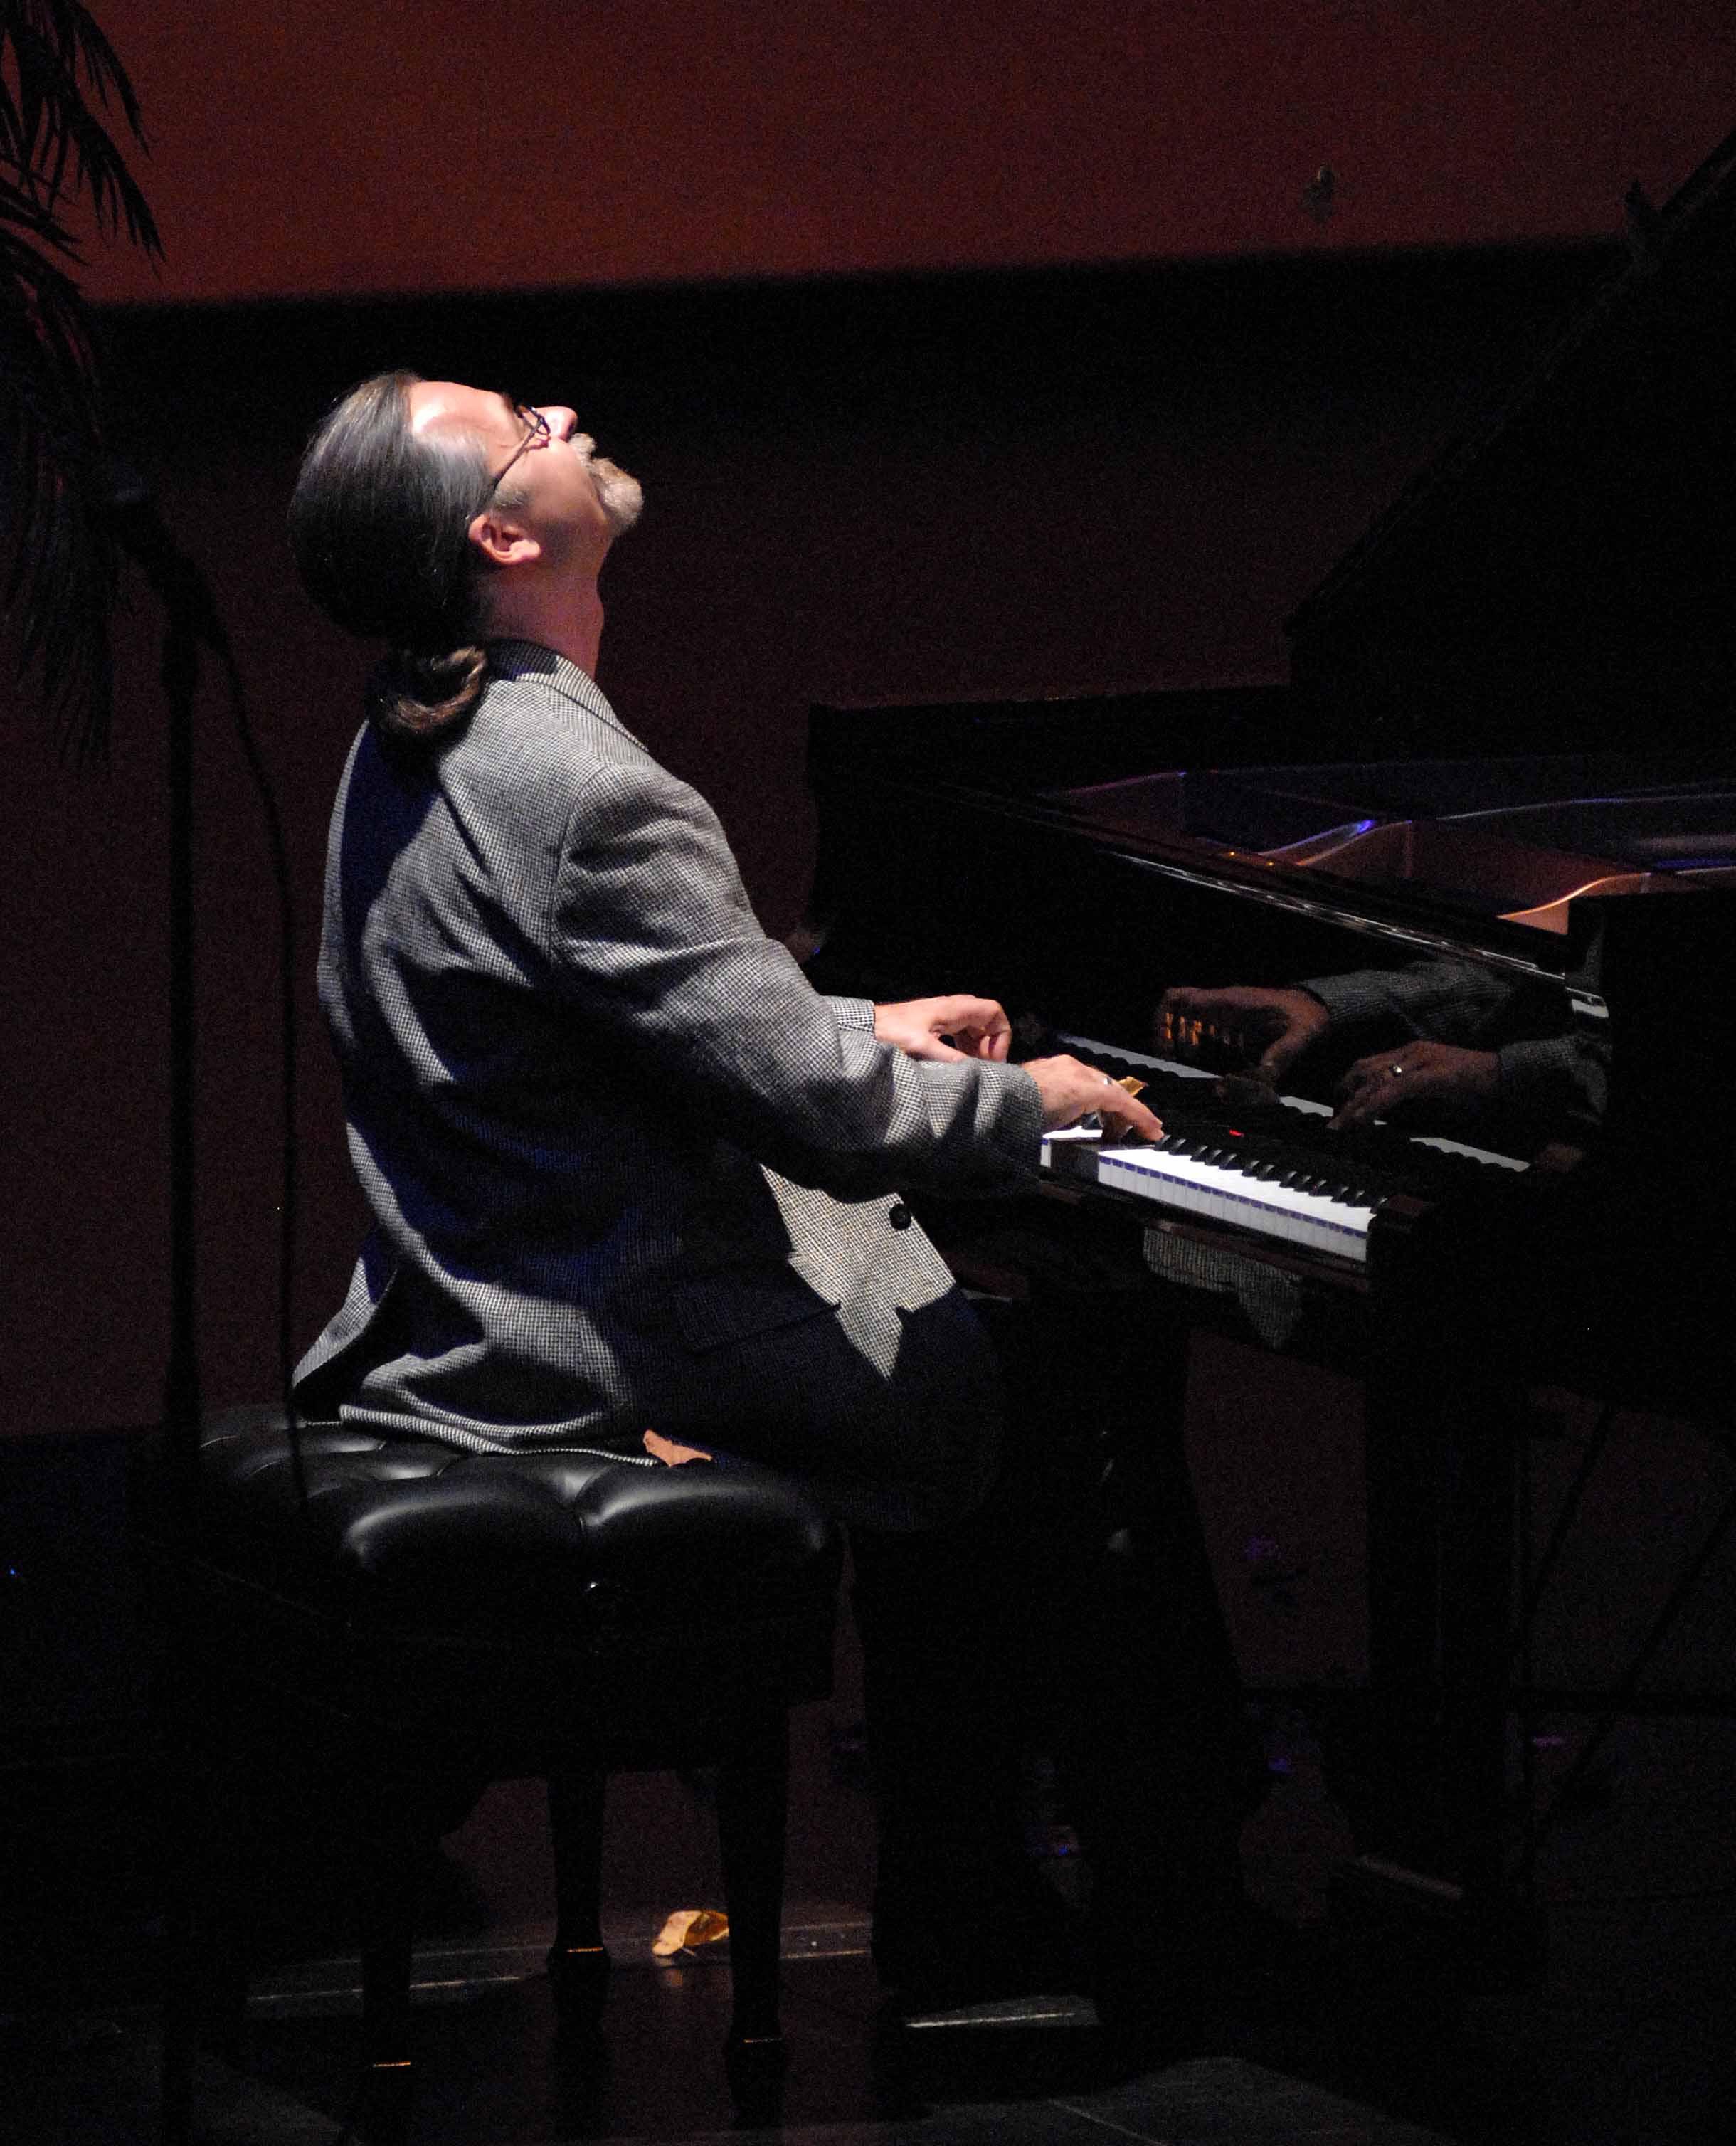 Ecstatic jazz pianist